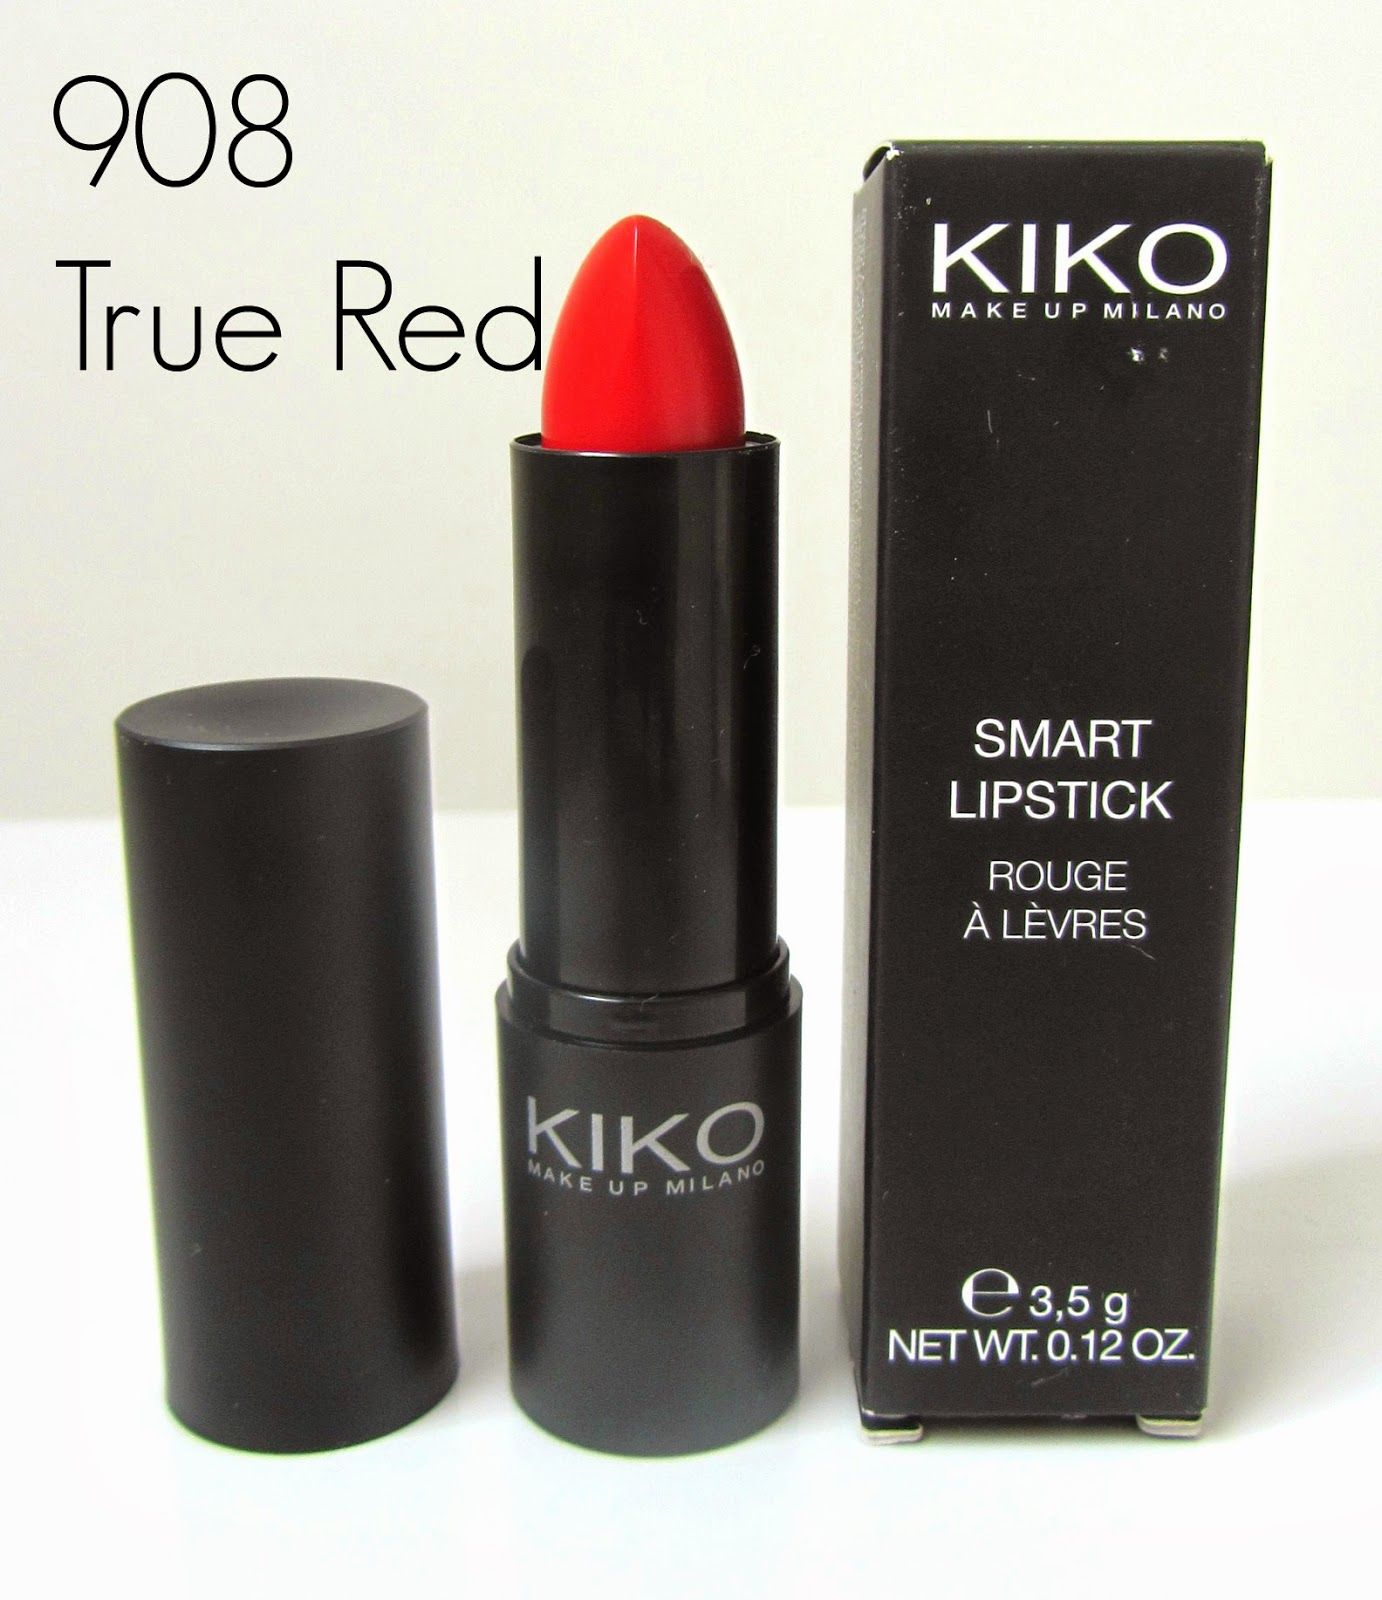 Kiko Smart Lipstick : 908 True Red